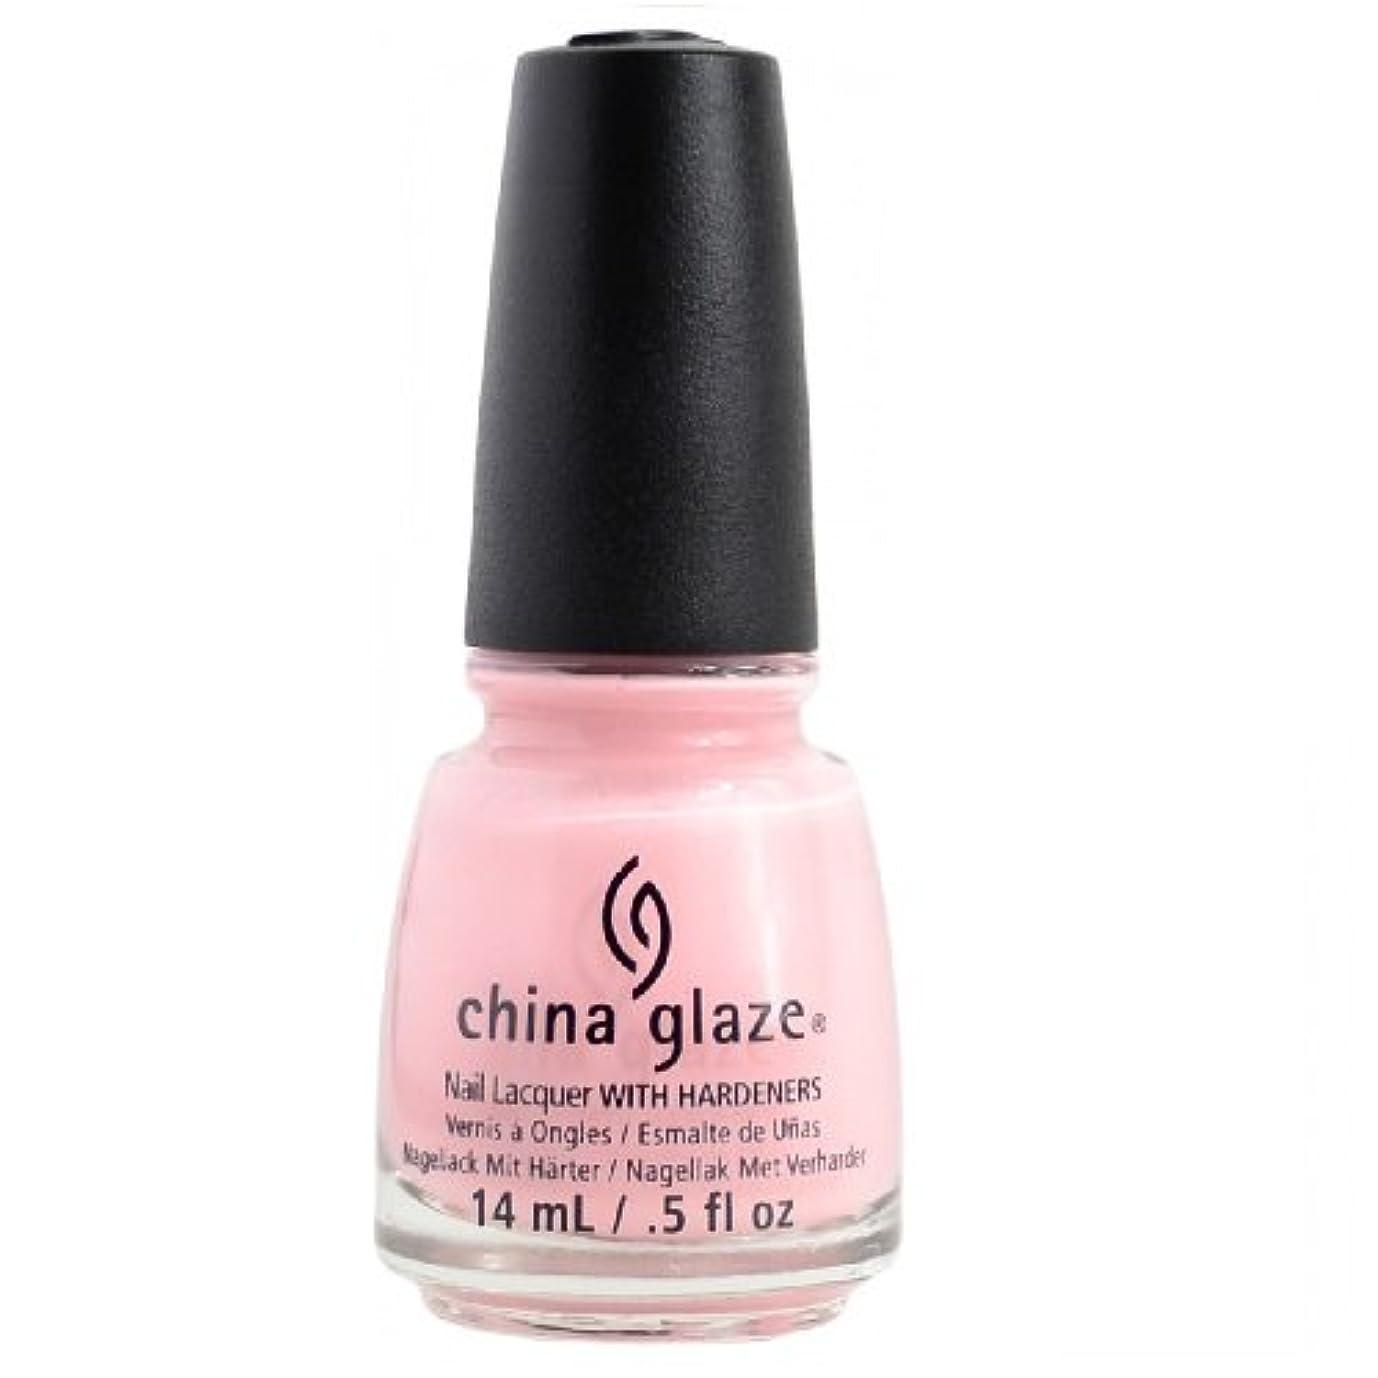 CHINA GLAZE Nail Lacquer - Art City Flourish - Spring In My Step